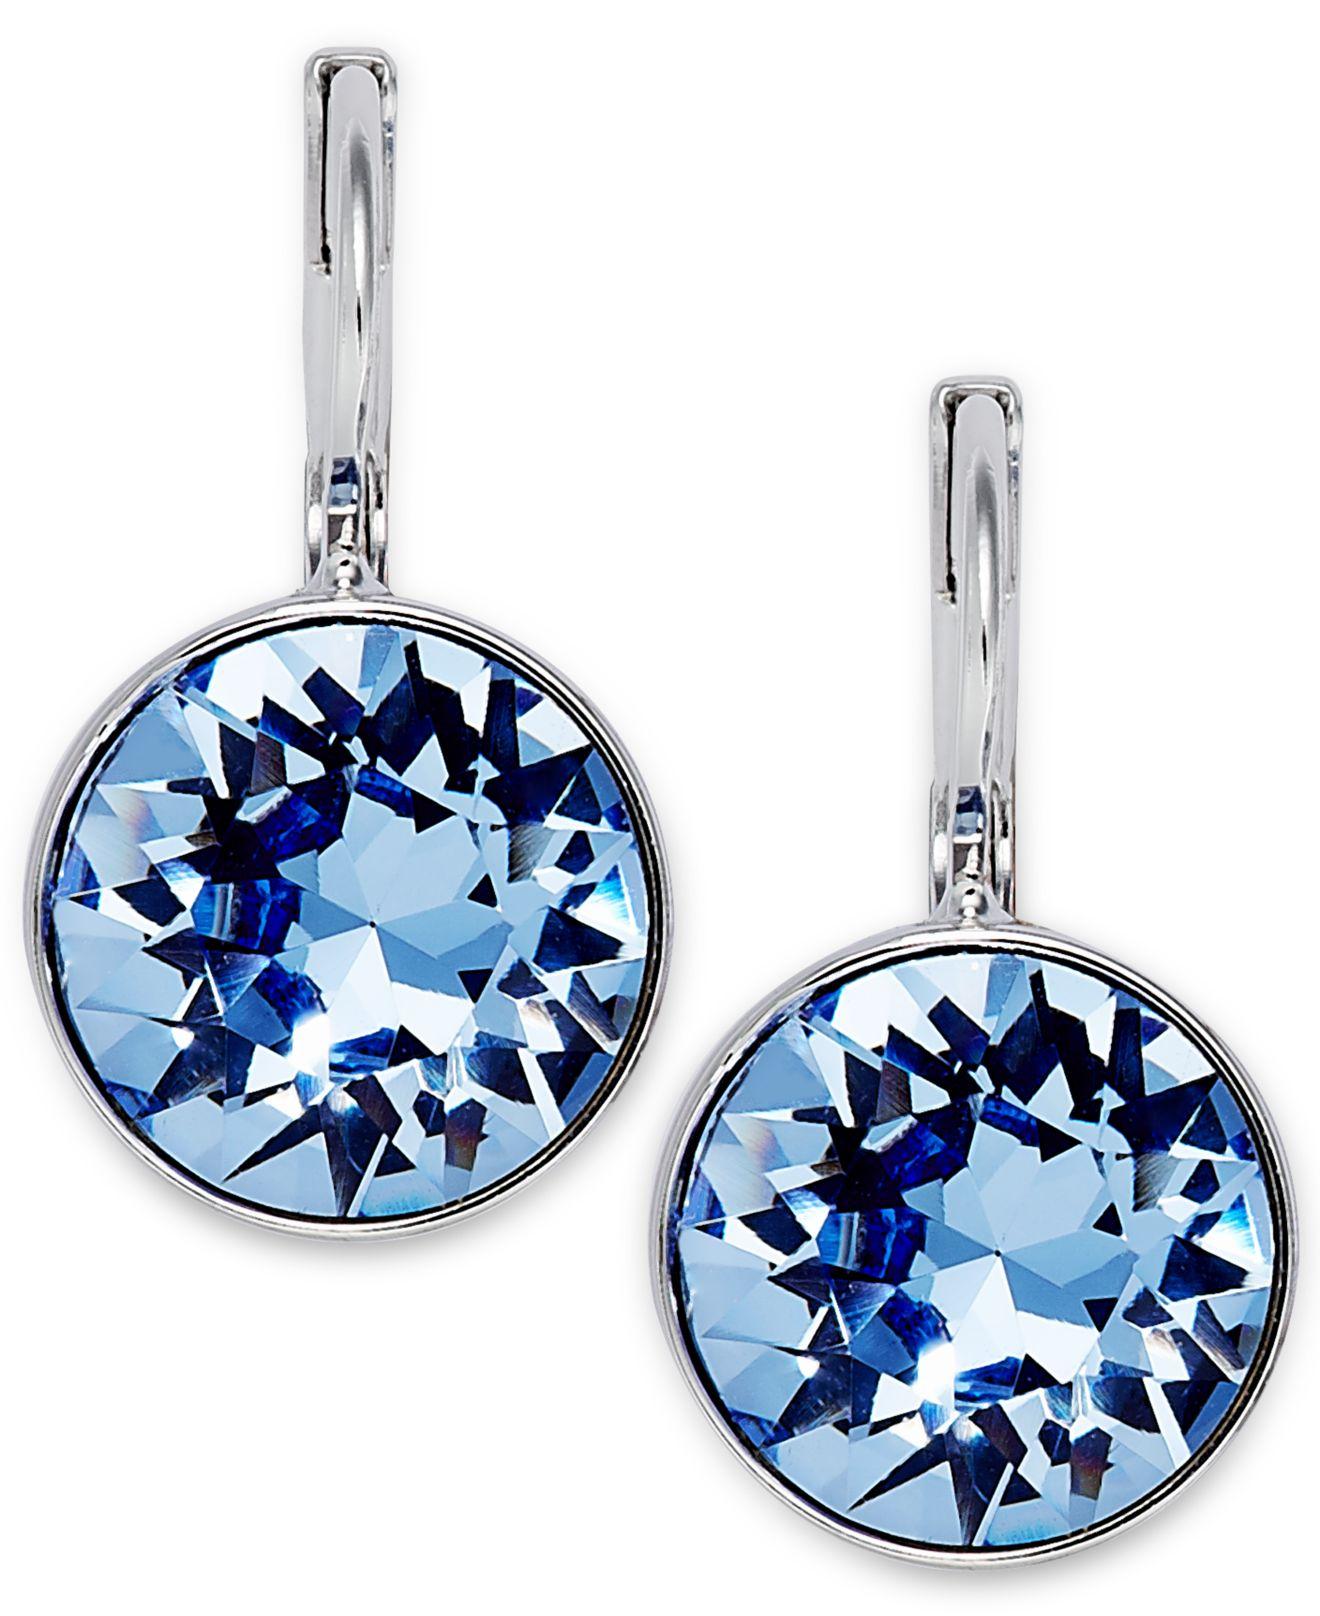 Swarovski Rhodium Plated Light Sapphire Crystal Drop